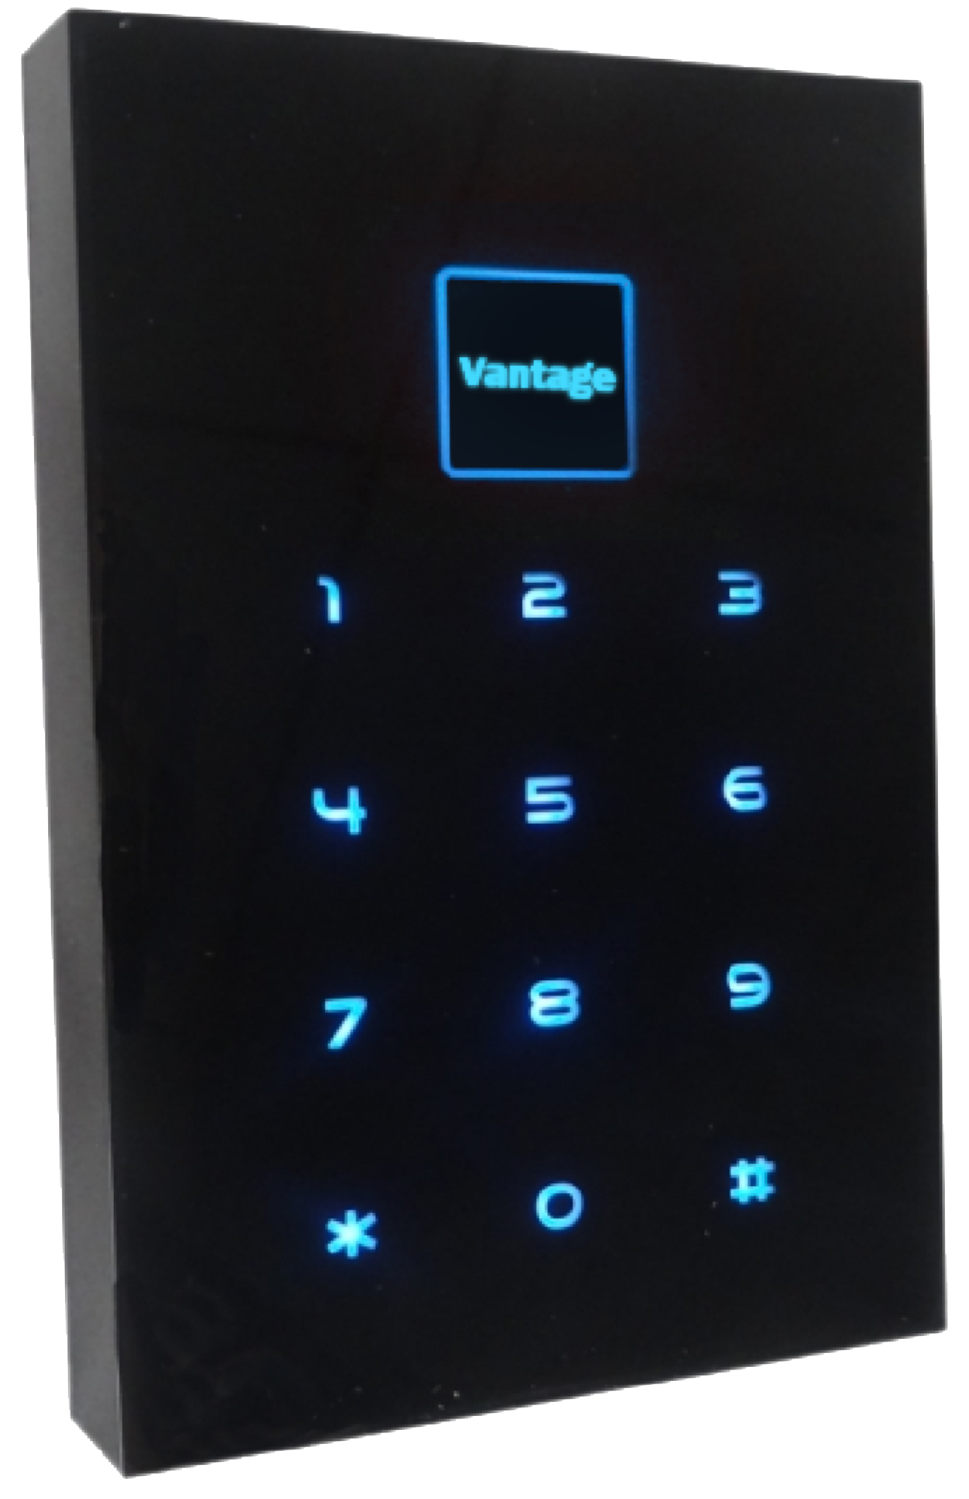 Touch Keypad Door Controller Vantage Security Burglar Alarm Control Image Of